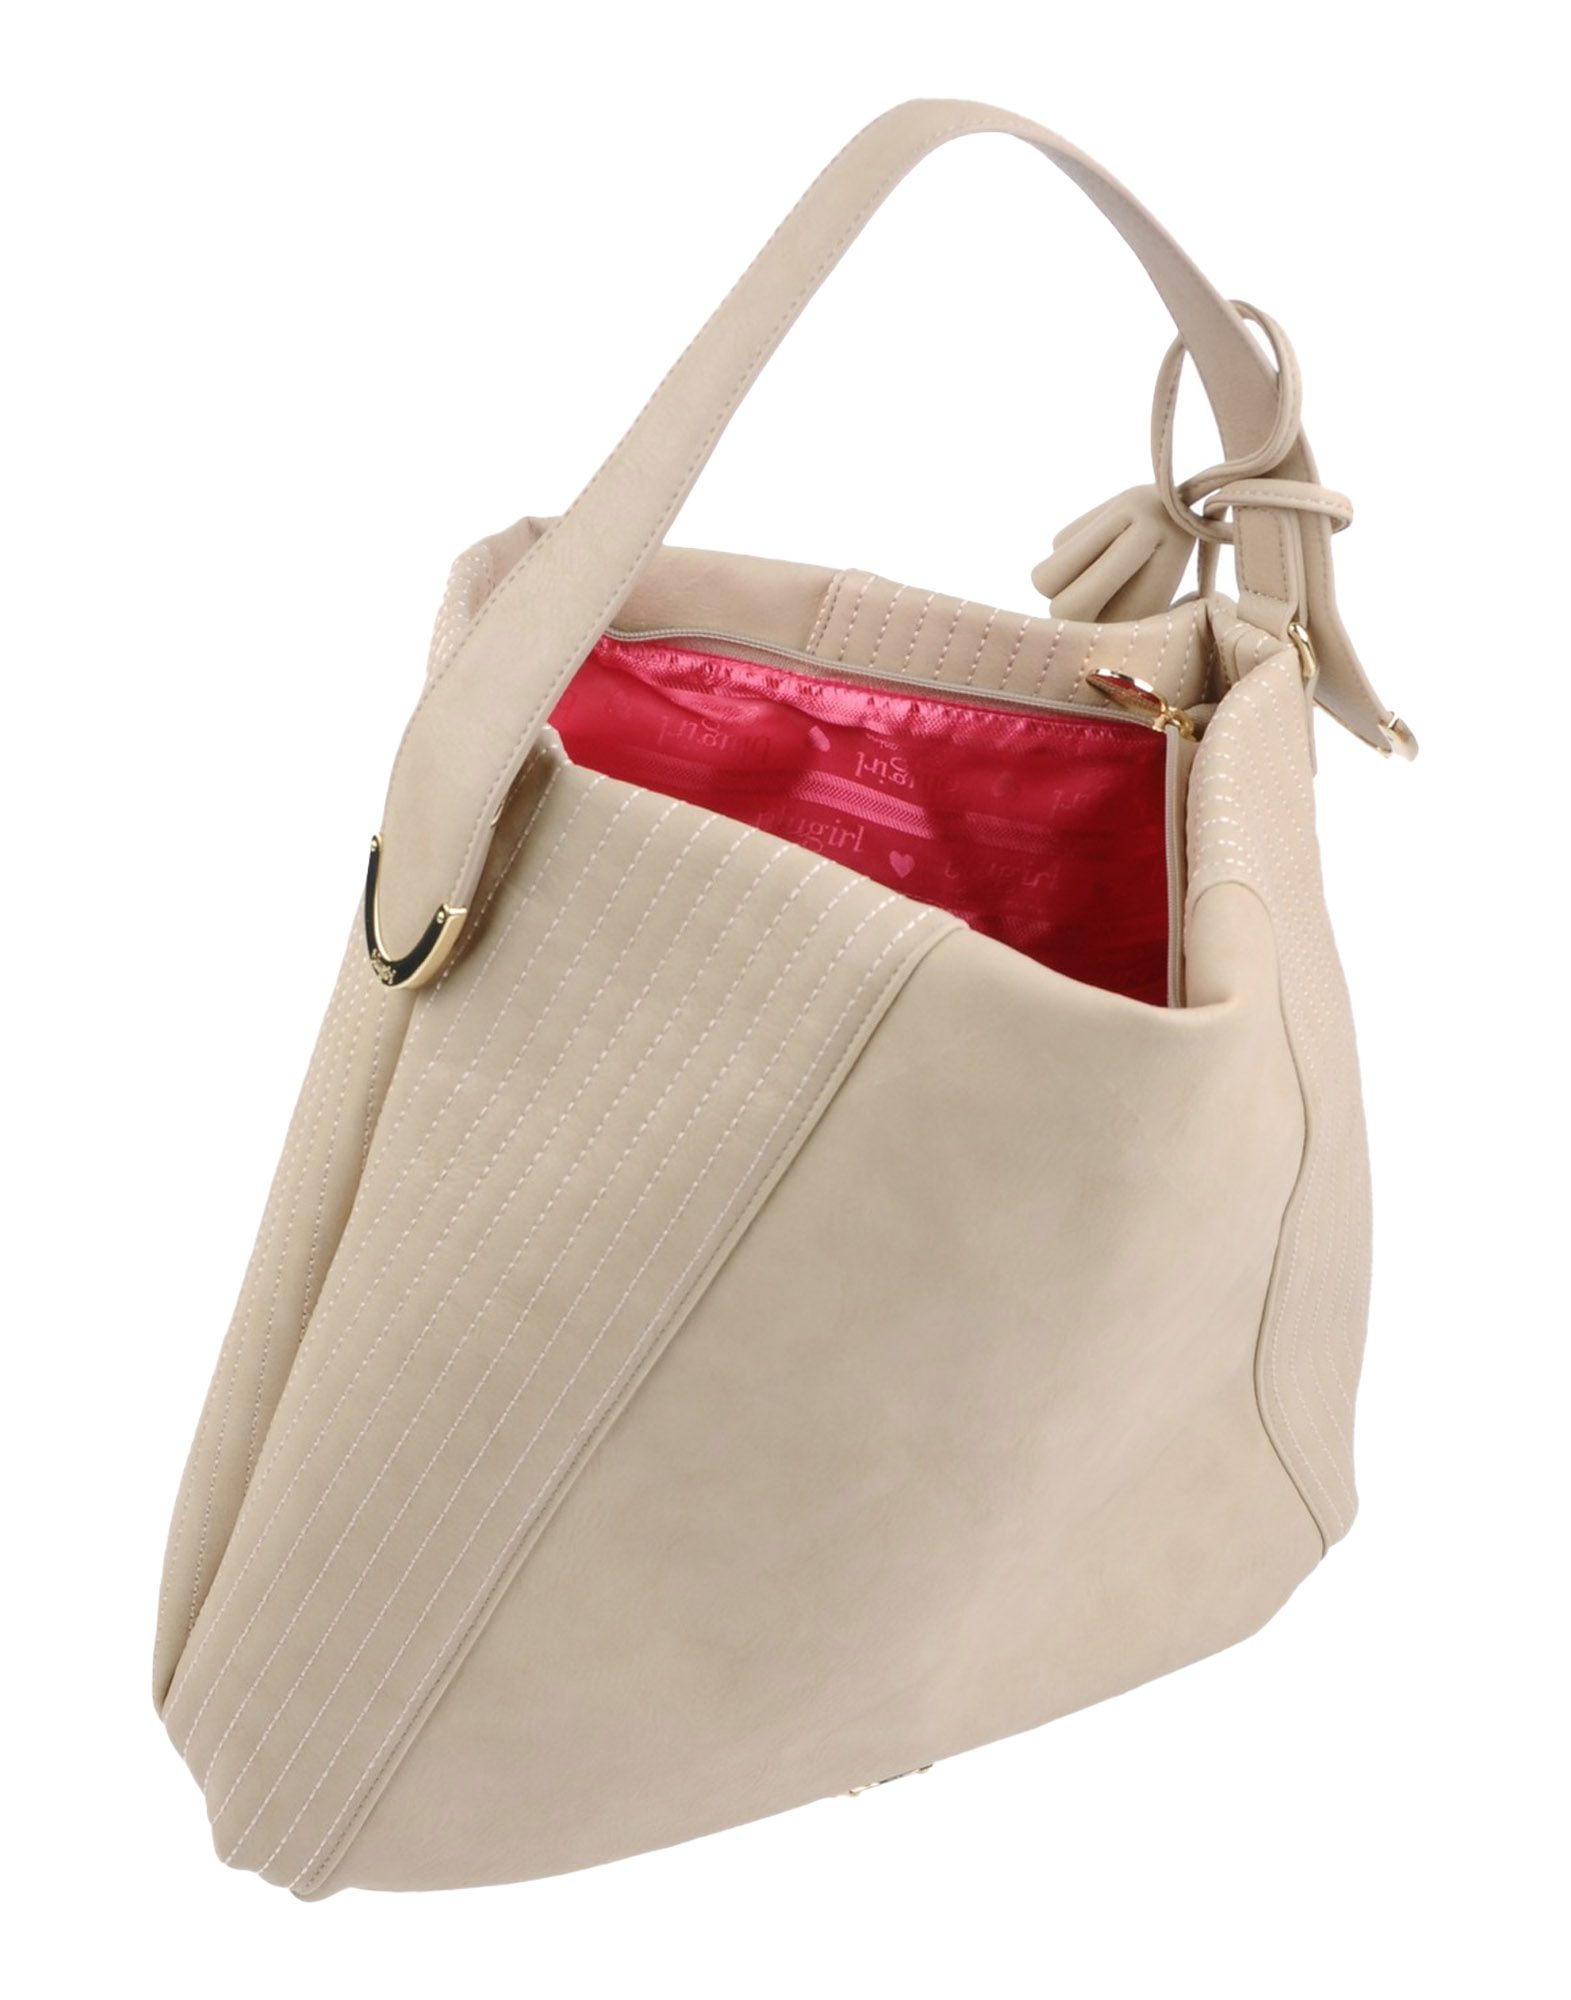 Blugirl blumarine Handbag in Beige